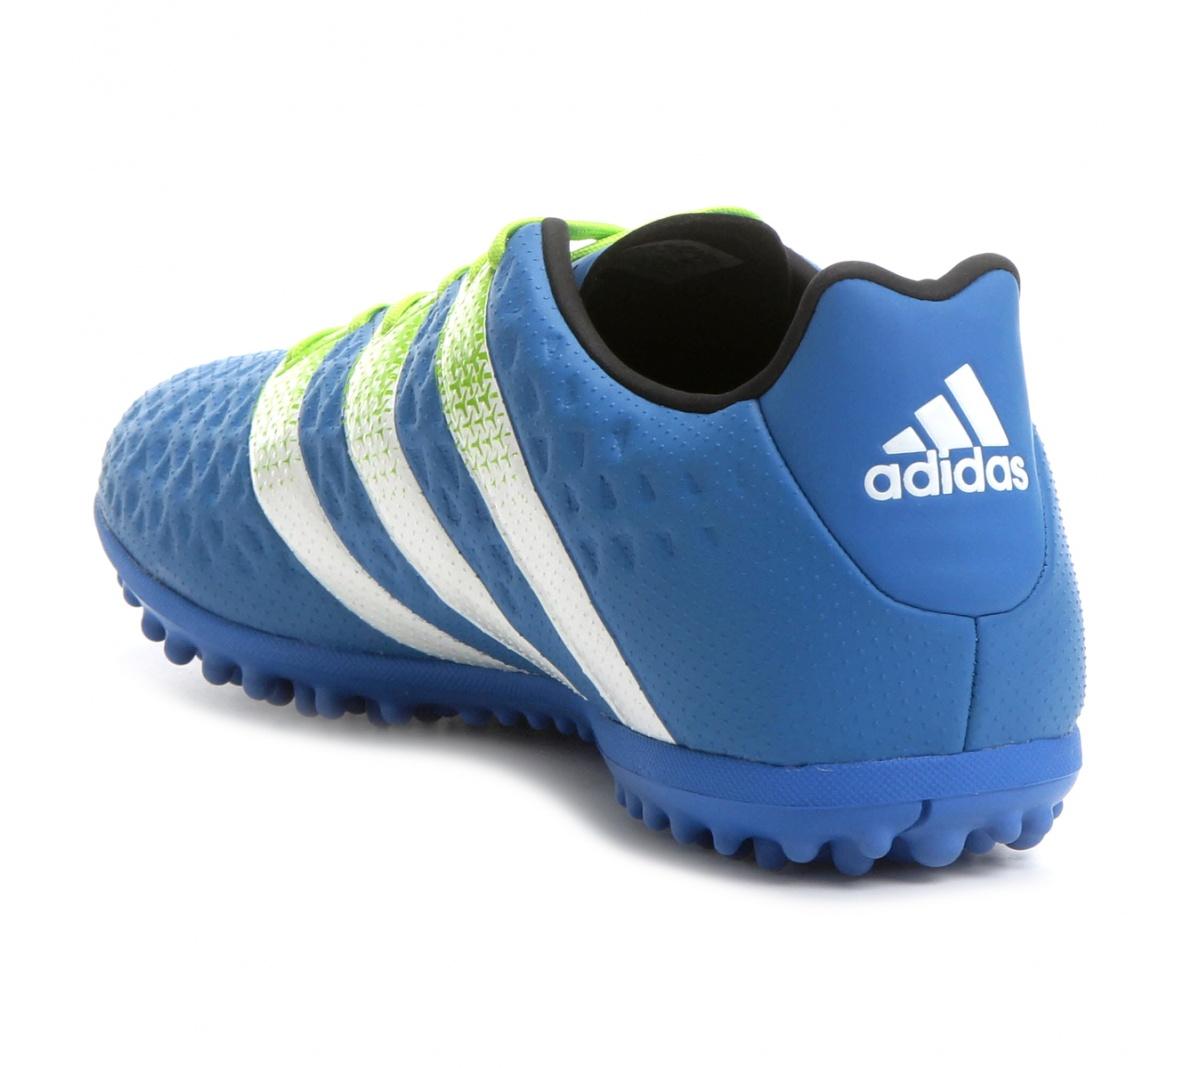 133f06ead62 chuteira adidas futsal. Carregando zoom. adidas azul chuteira